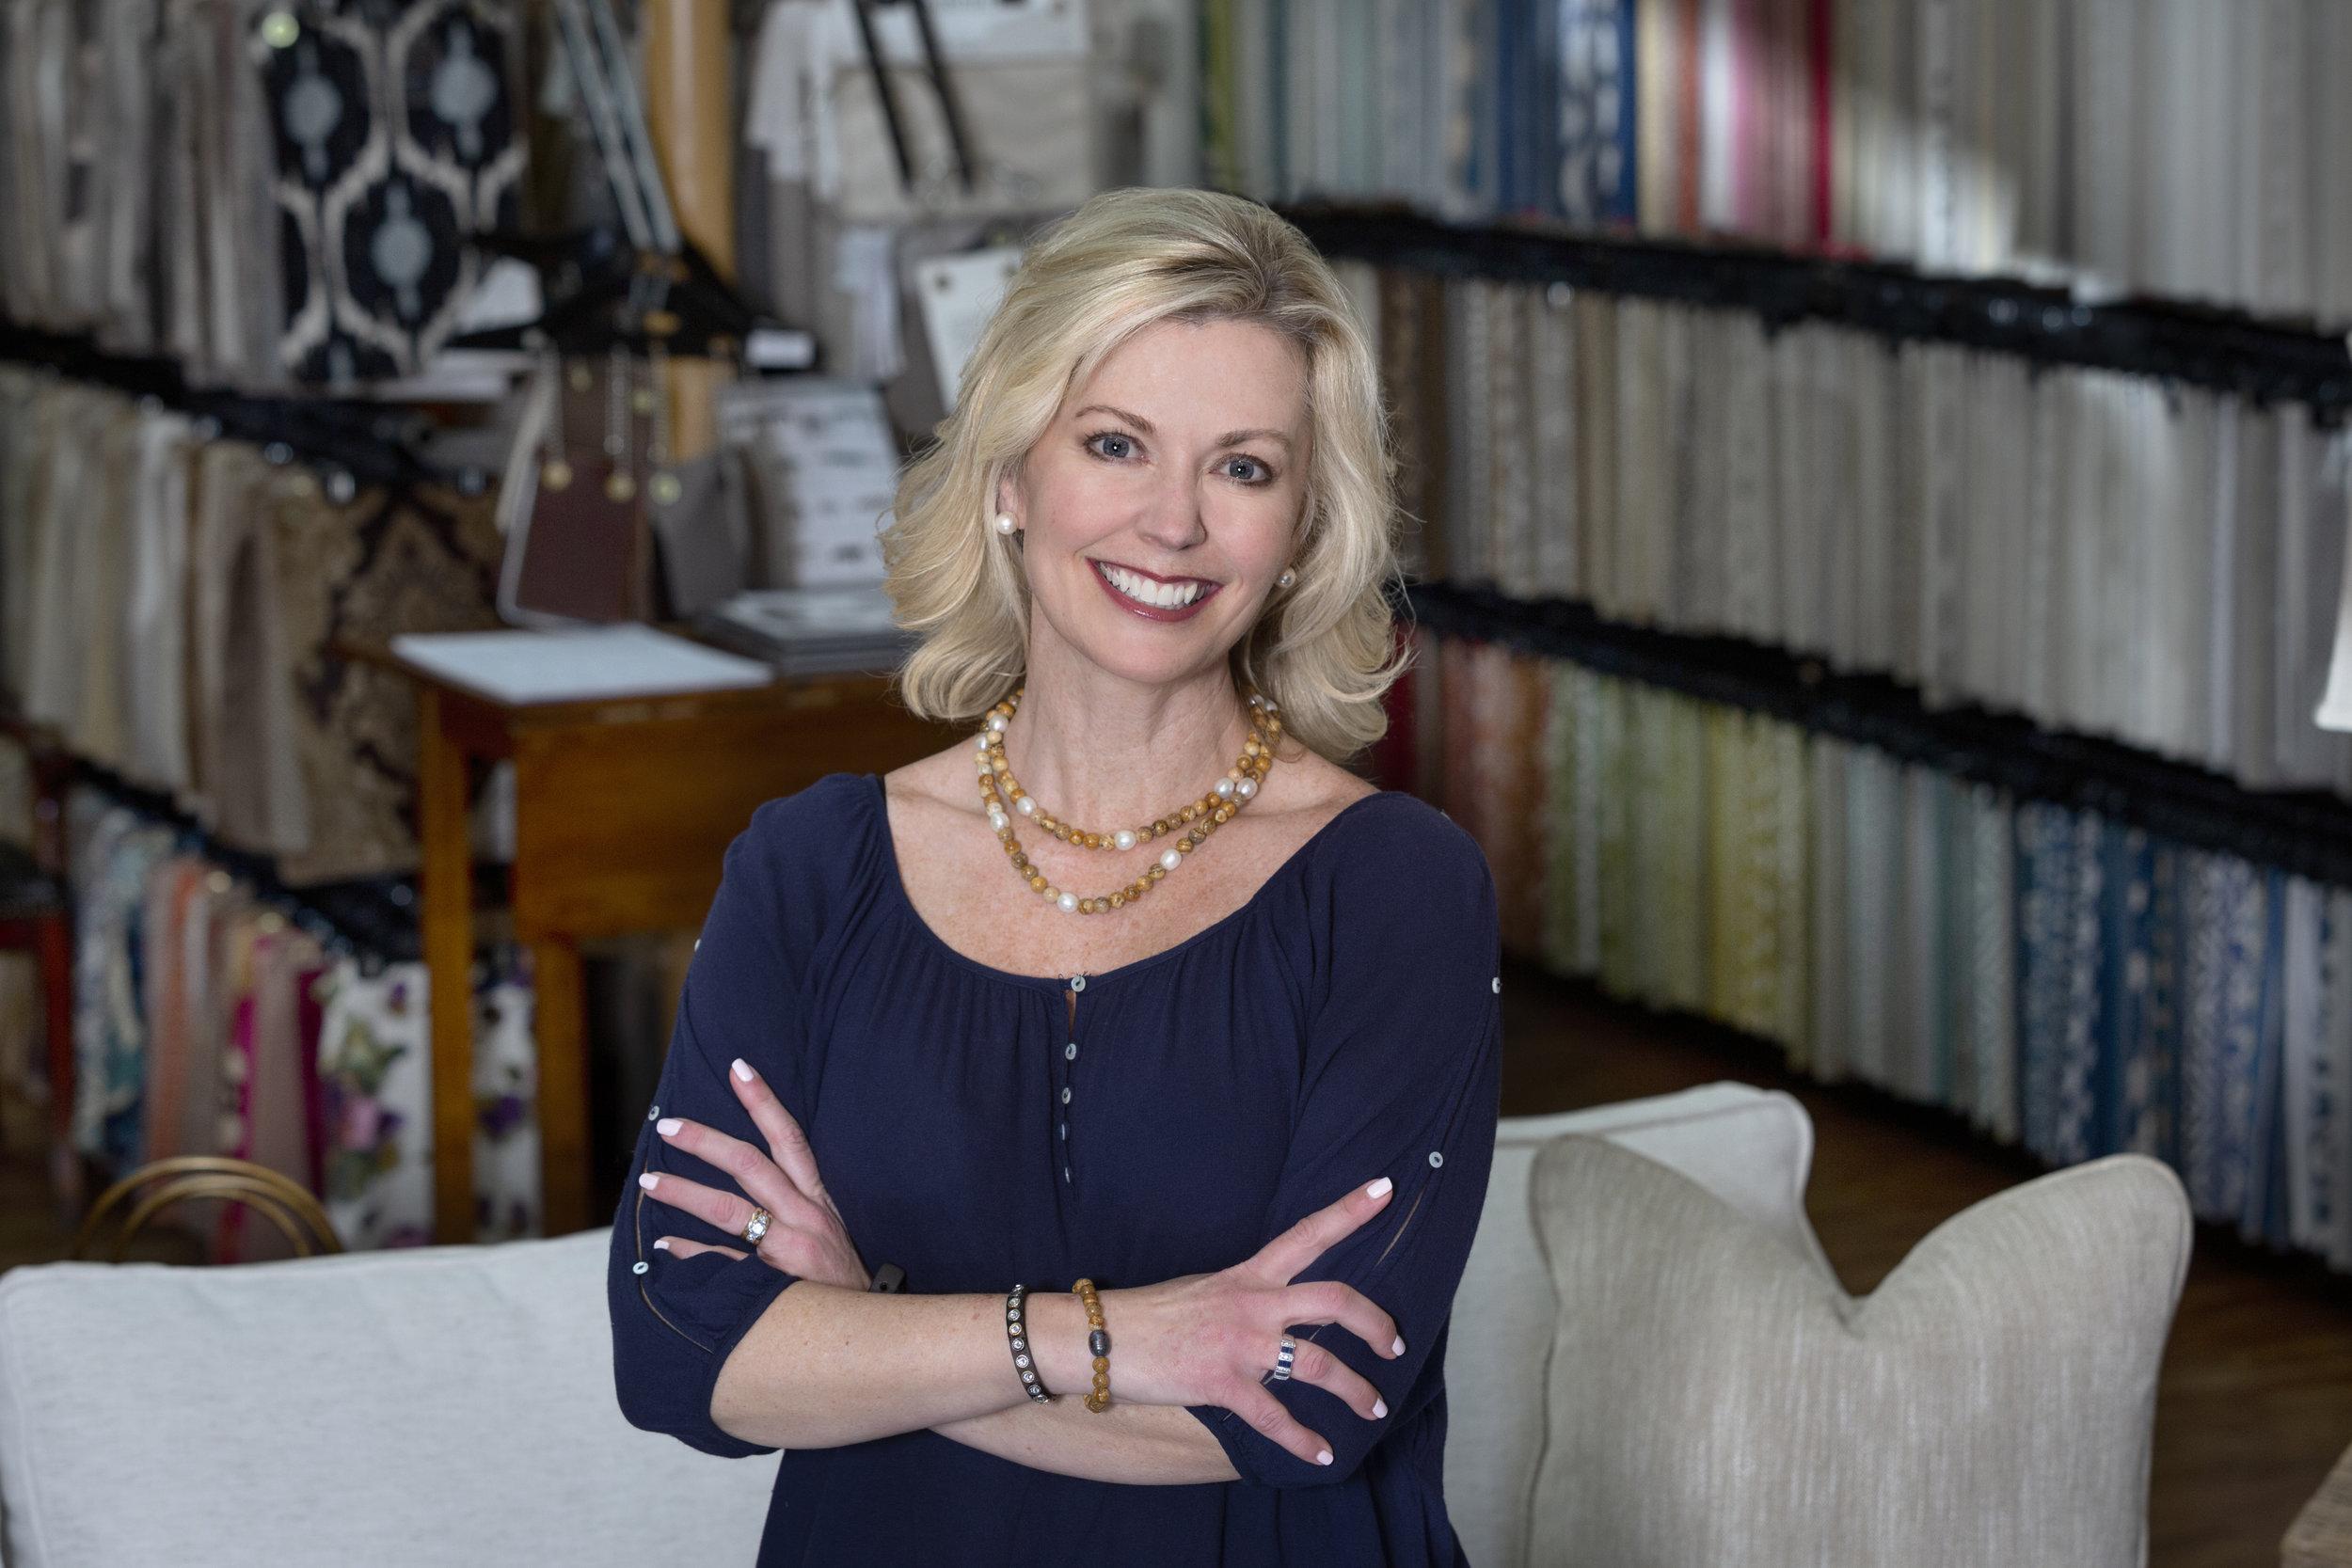 CHERIE SMITH - Owner, Manoirs Nashville